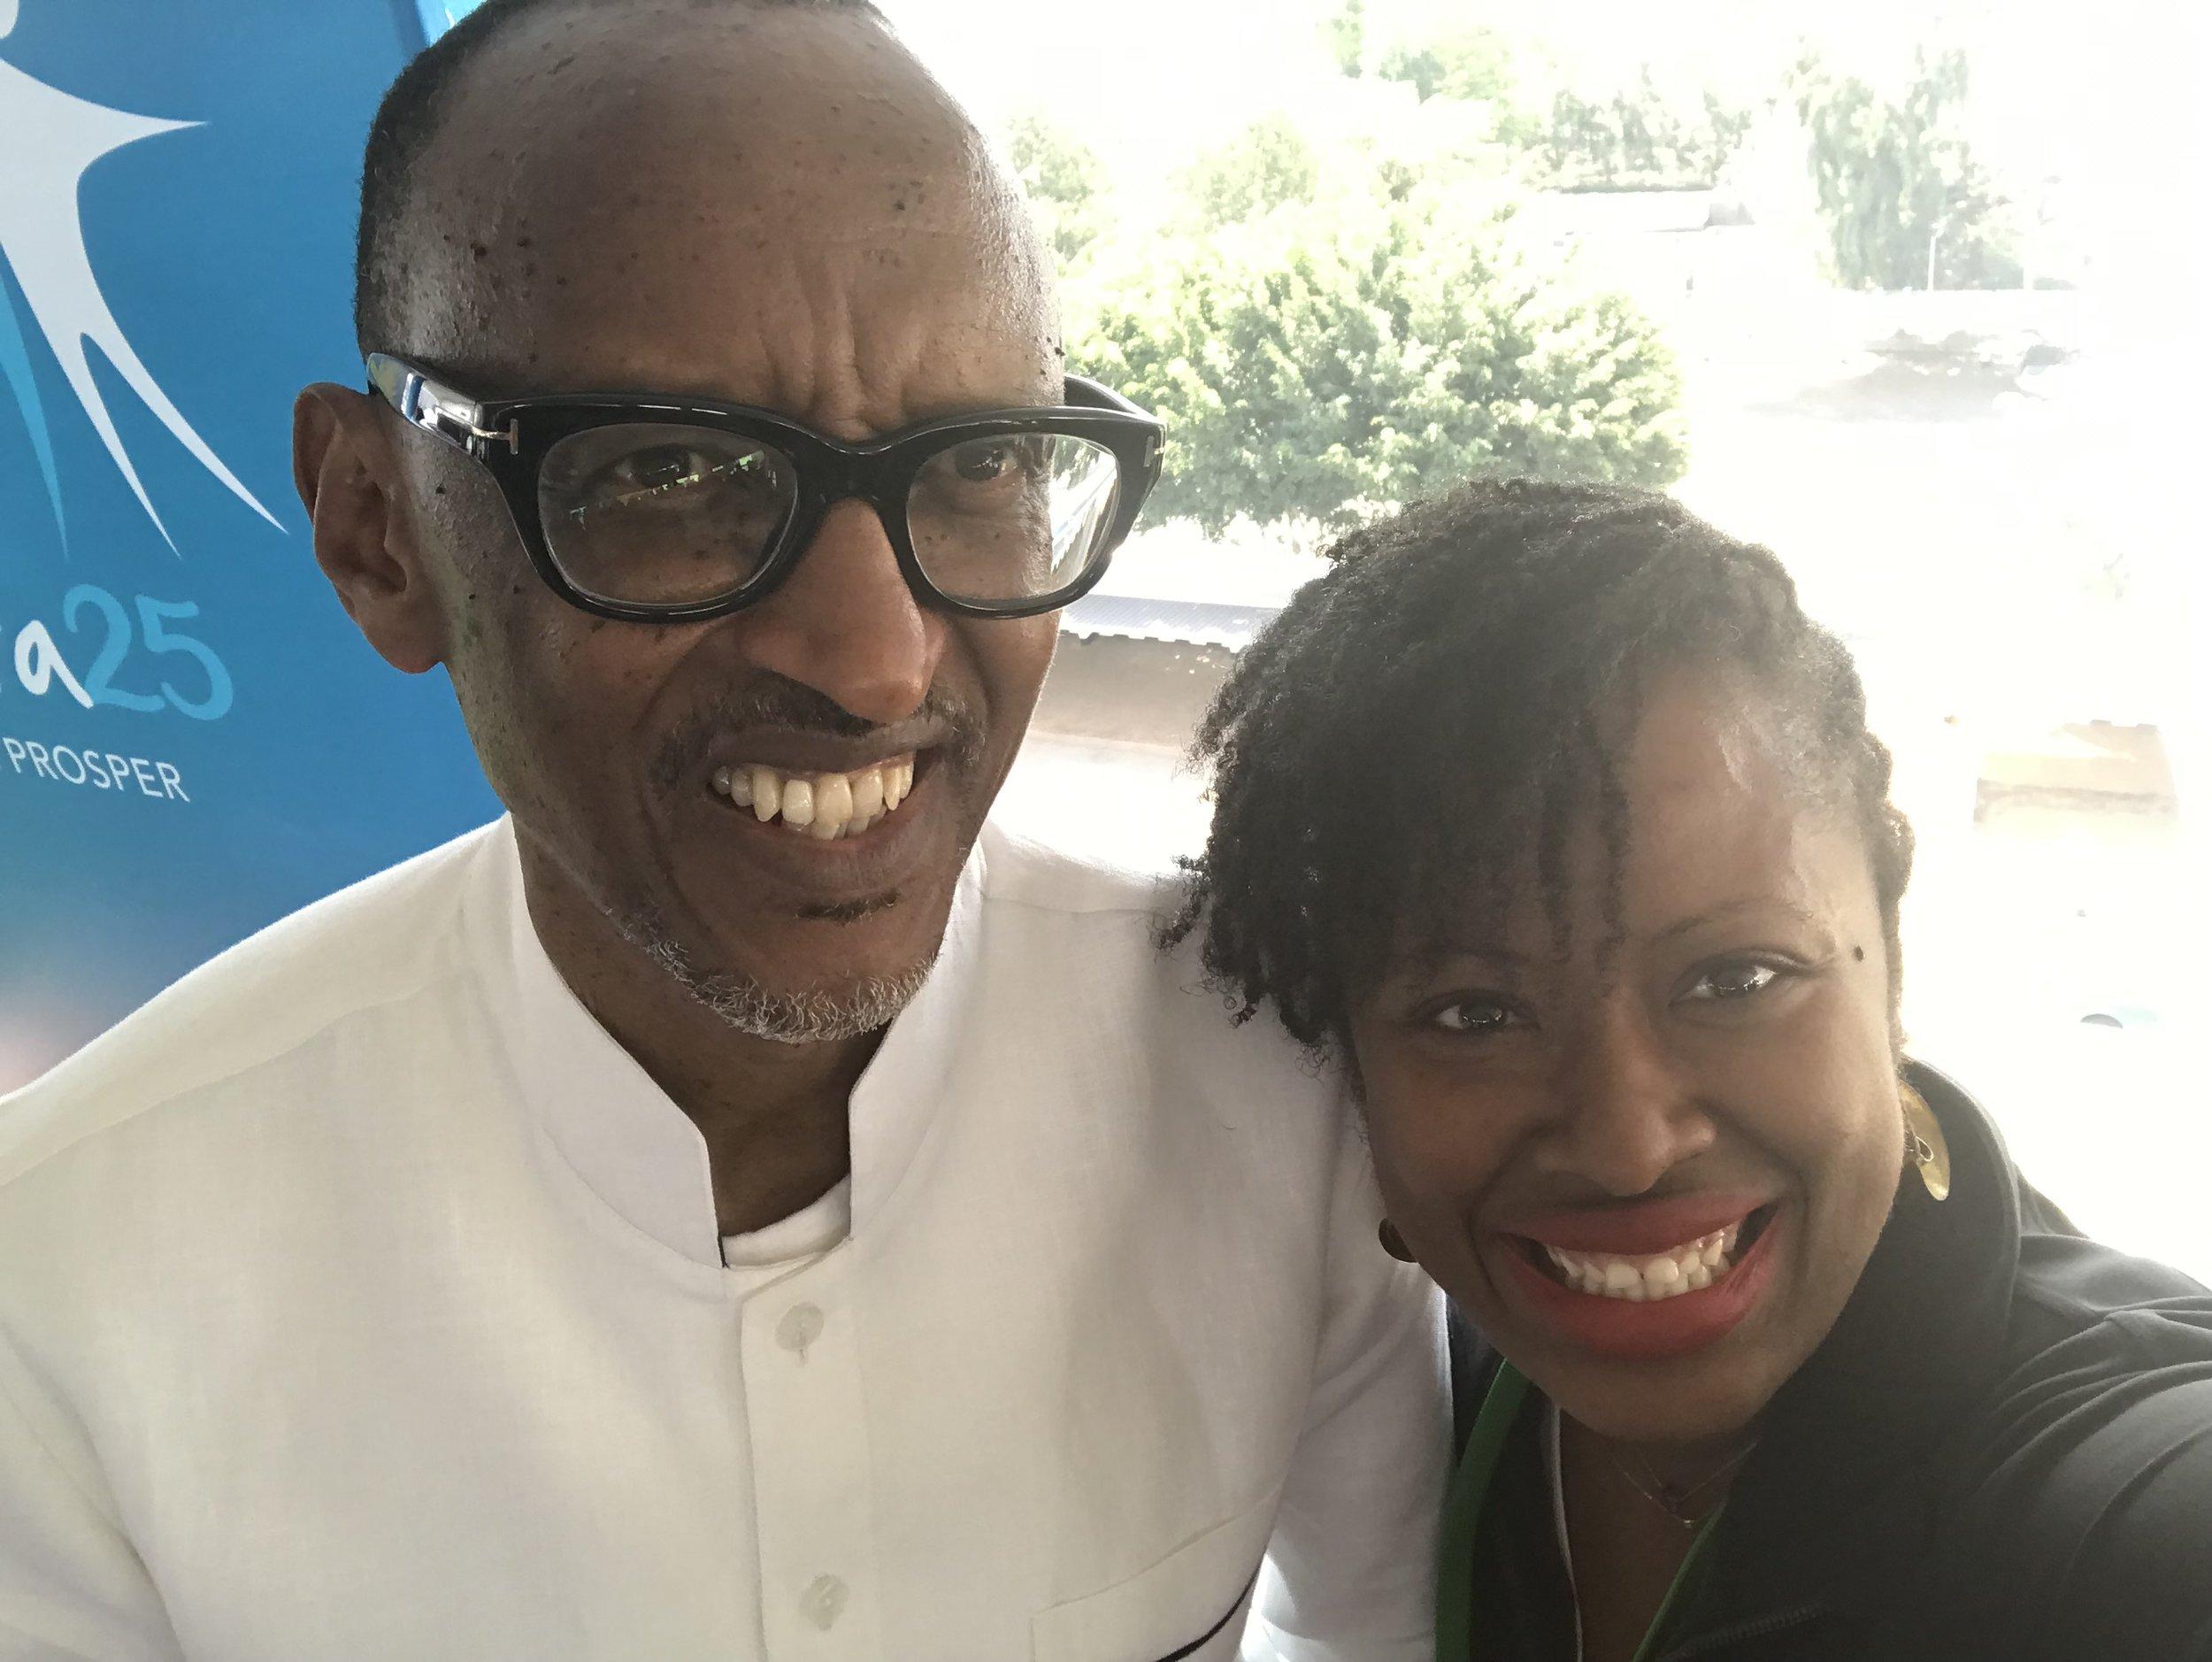 IMG_5600 2VickieRemoe-travel-kigali-rwanda-review-kwibohora25-hotels-africa.JPG